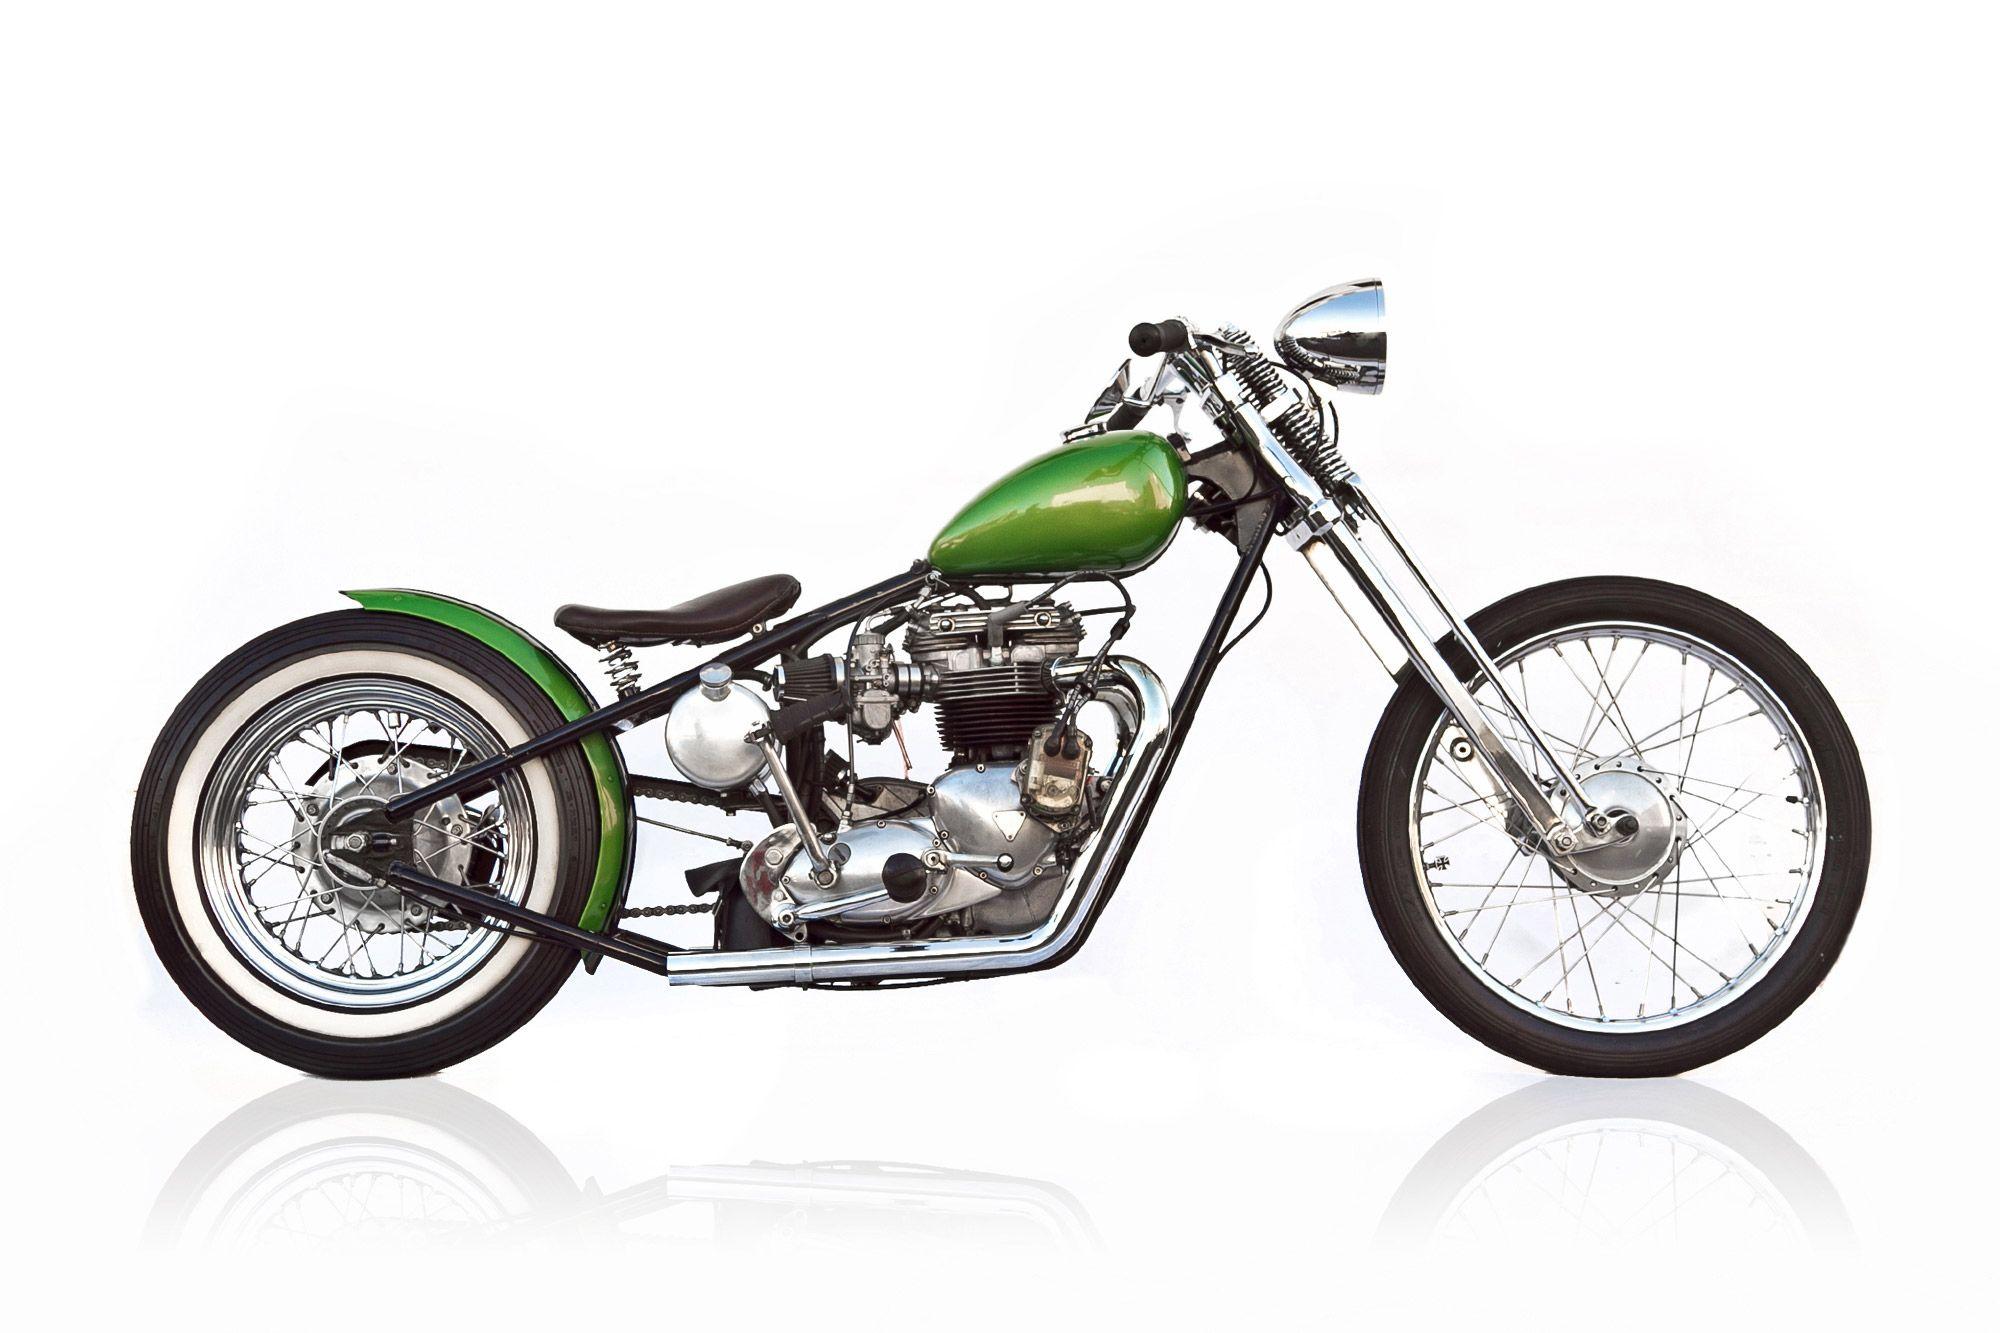 The Mono Auuscustoms Motorcycle Triumph